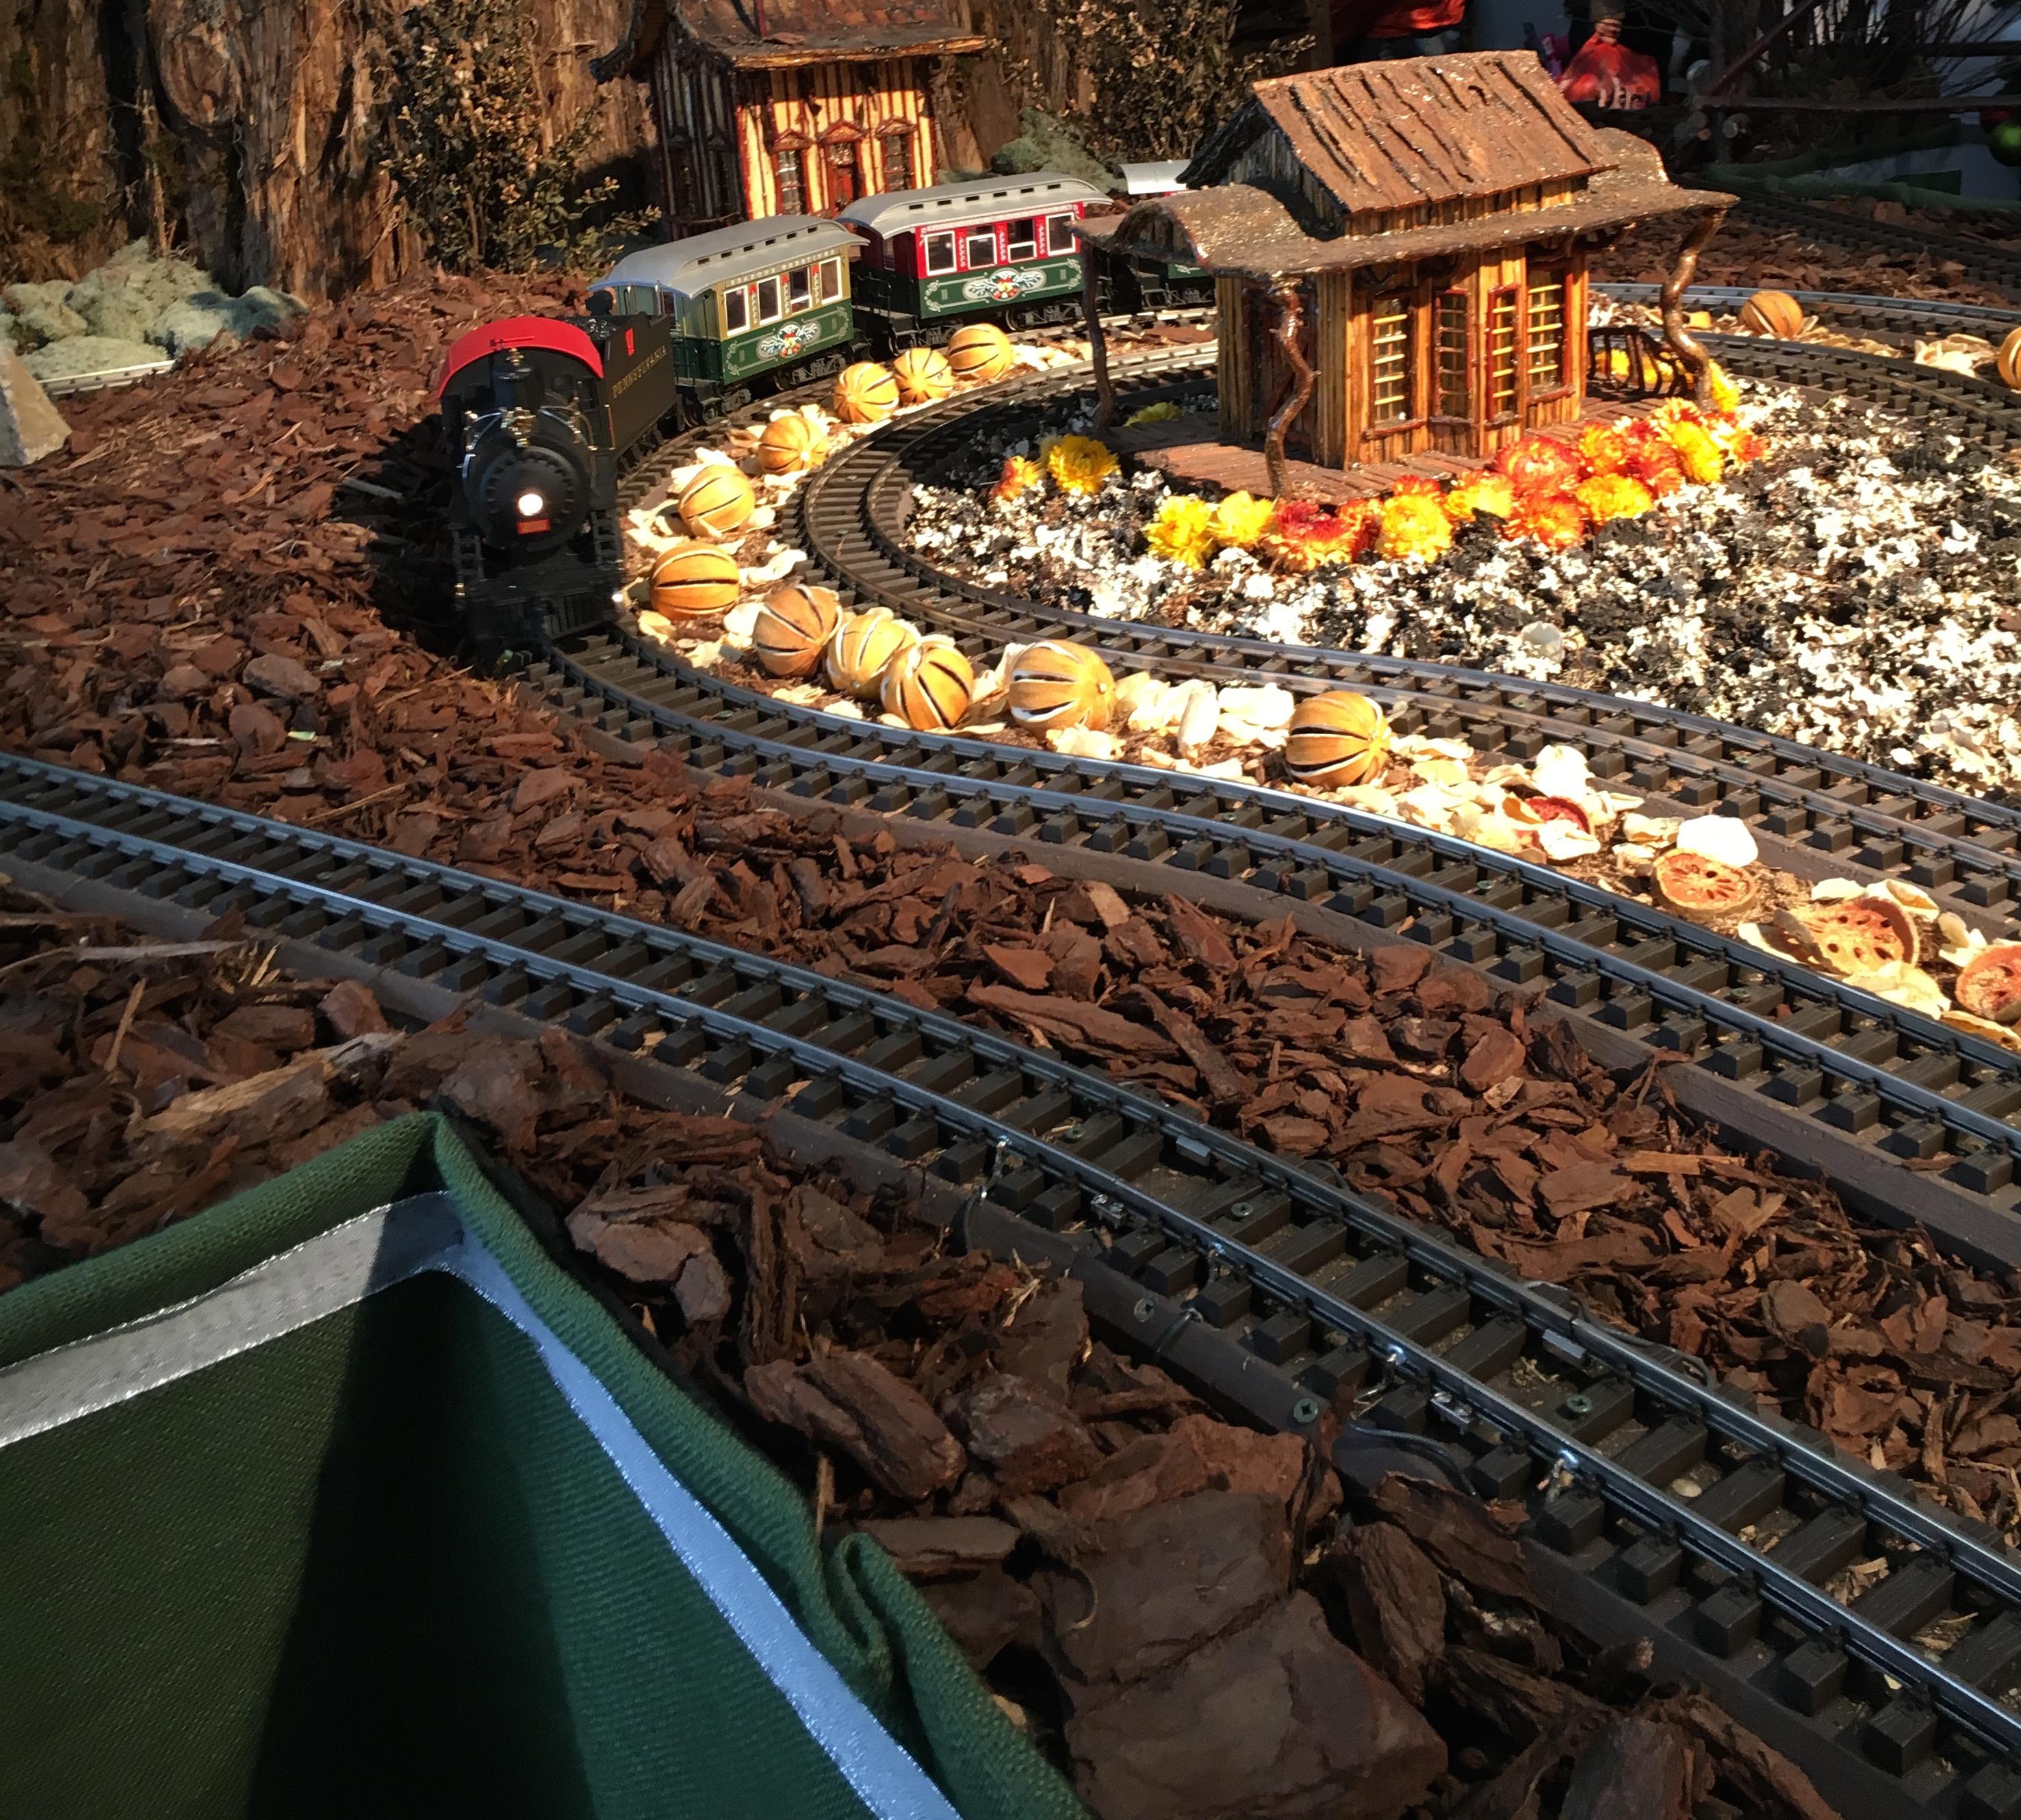 holiday train show trains